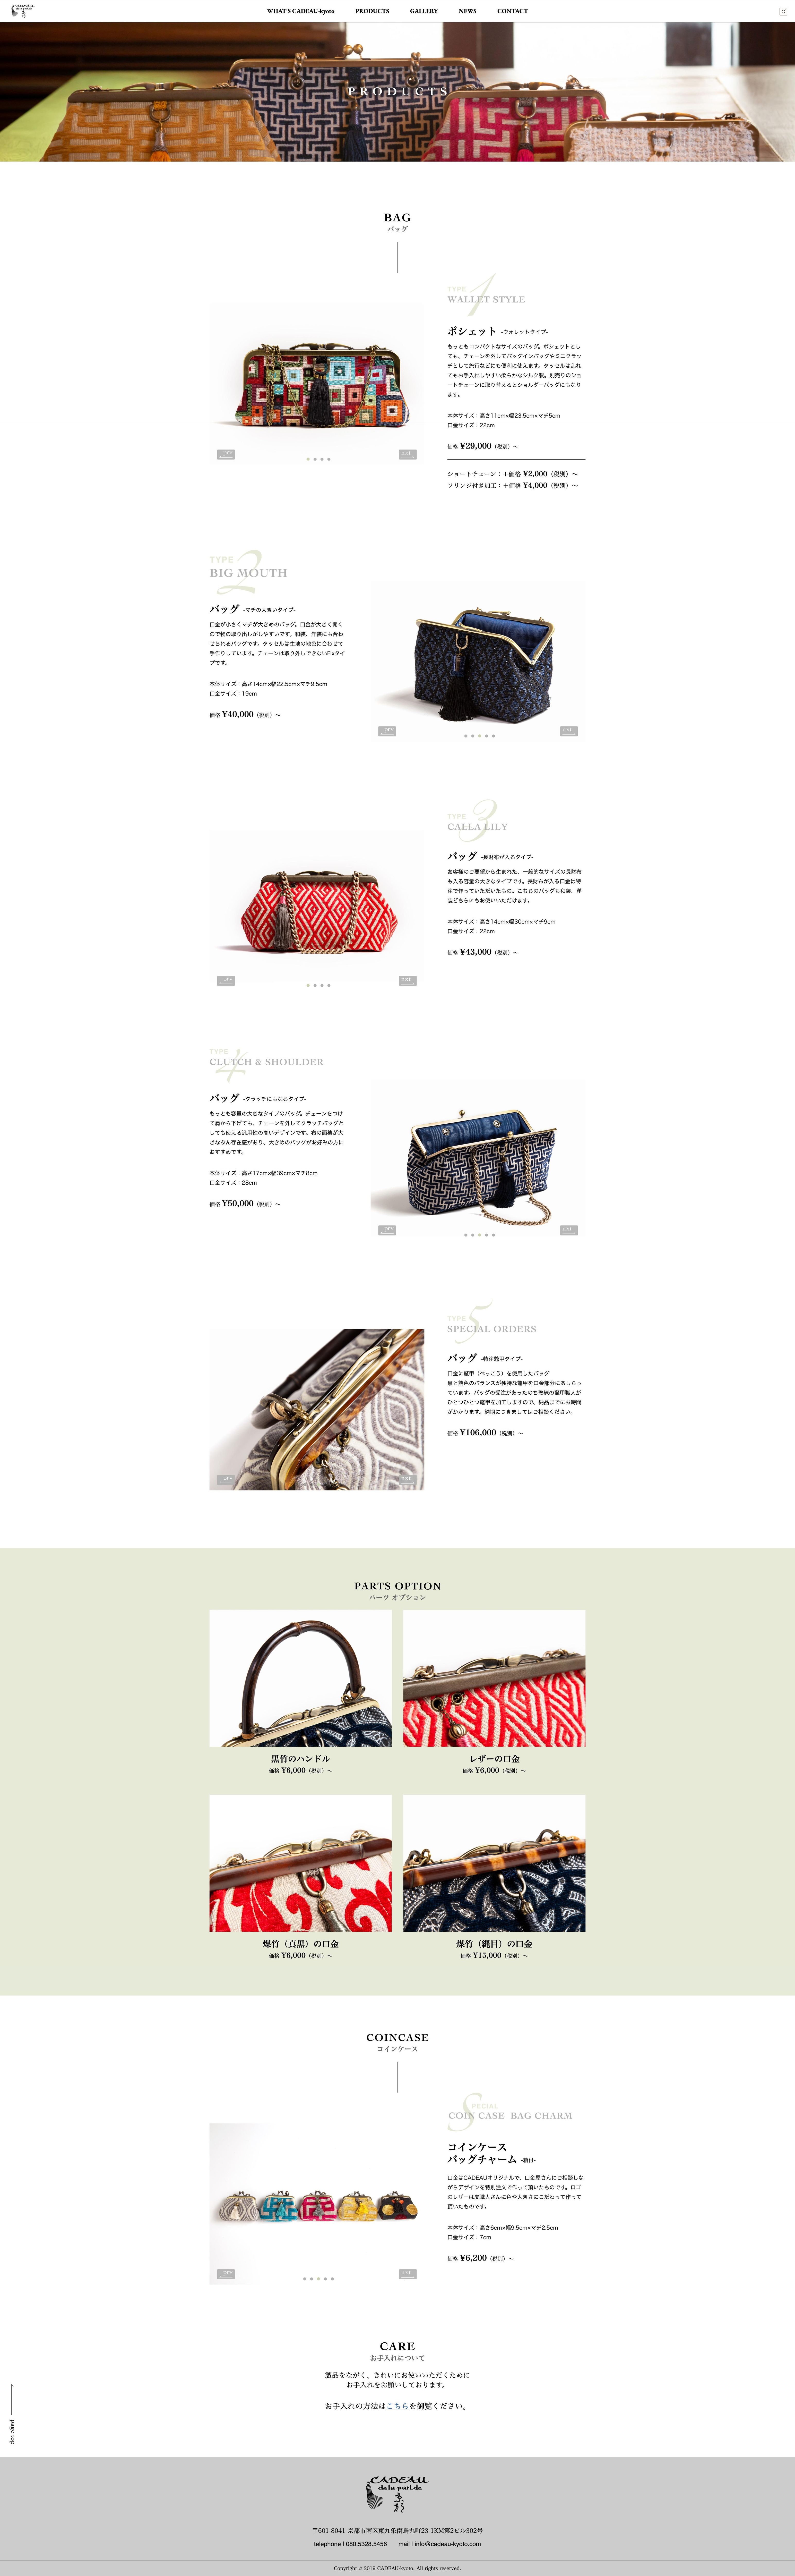 fireshot-capture-004-products-ca